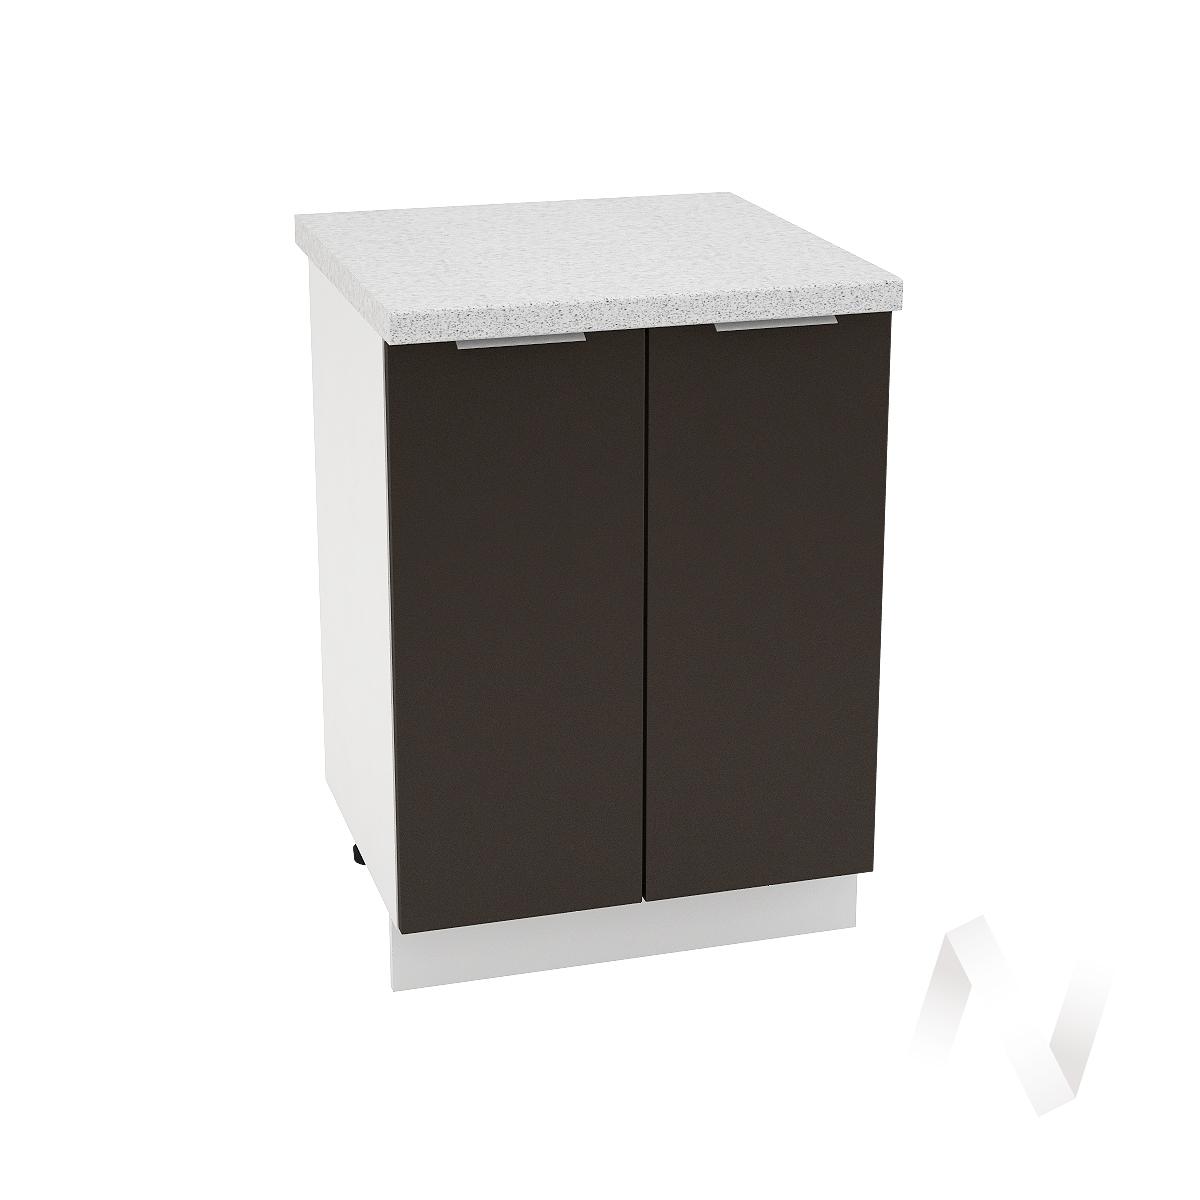 "Кухня ""Терра"": Шкаф нижний 600, ШН 600 (смоки софт/корпус белый)"